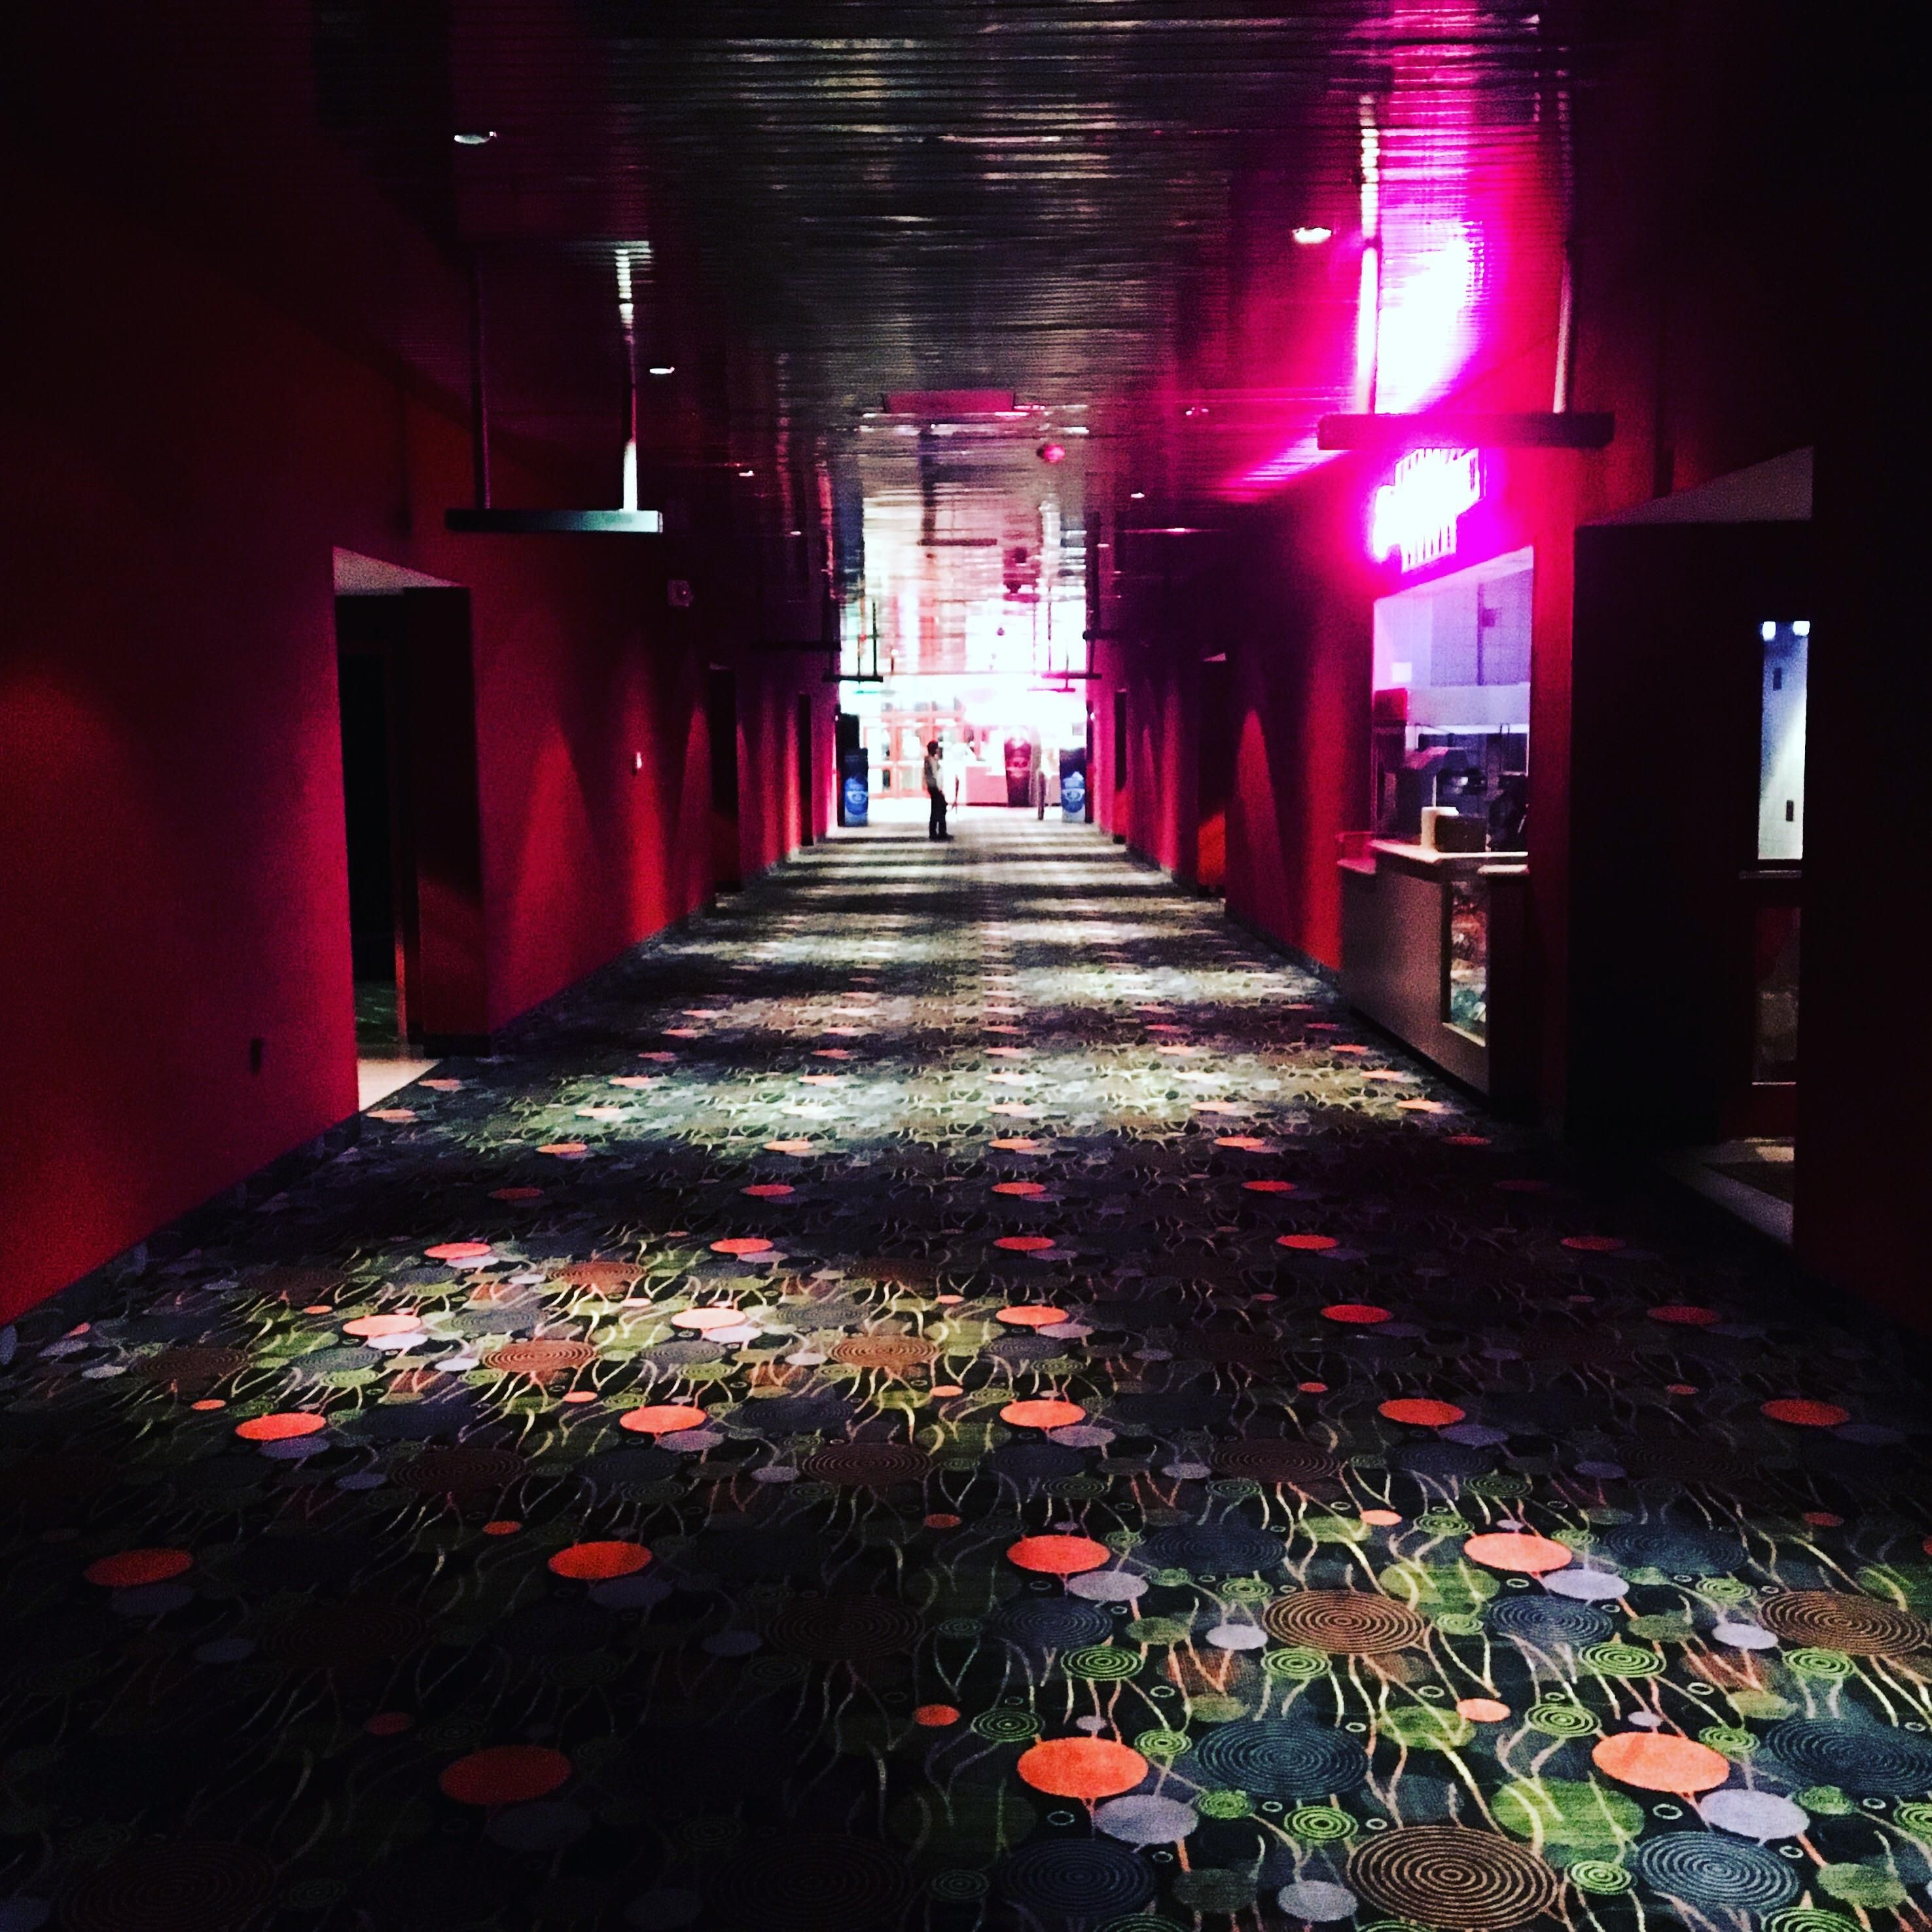 The Hallway #vaporwave #glitch #aesthetic #hypnagogic